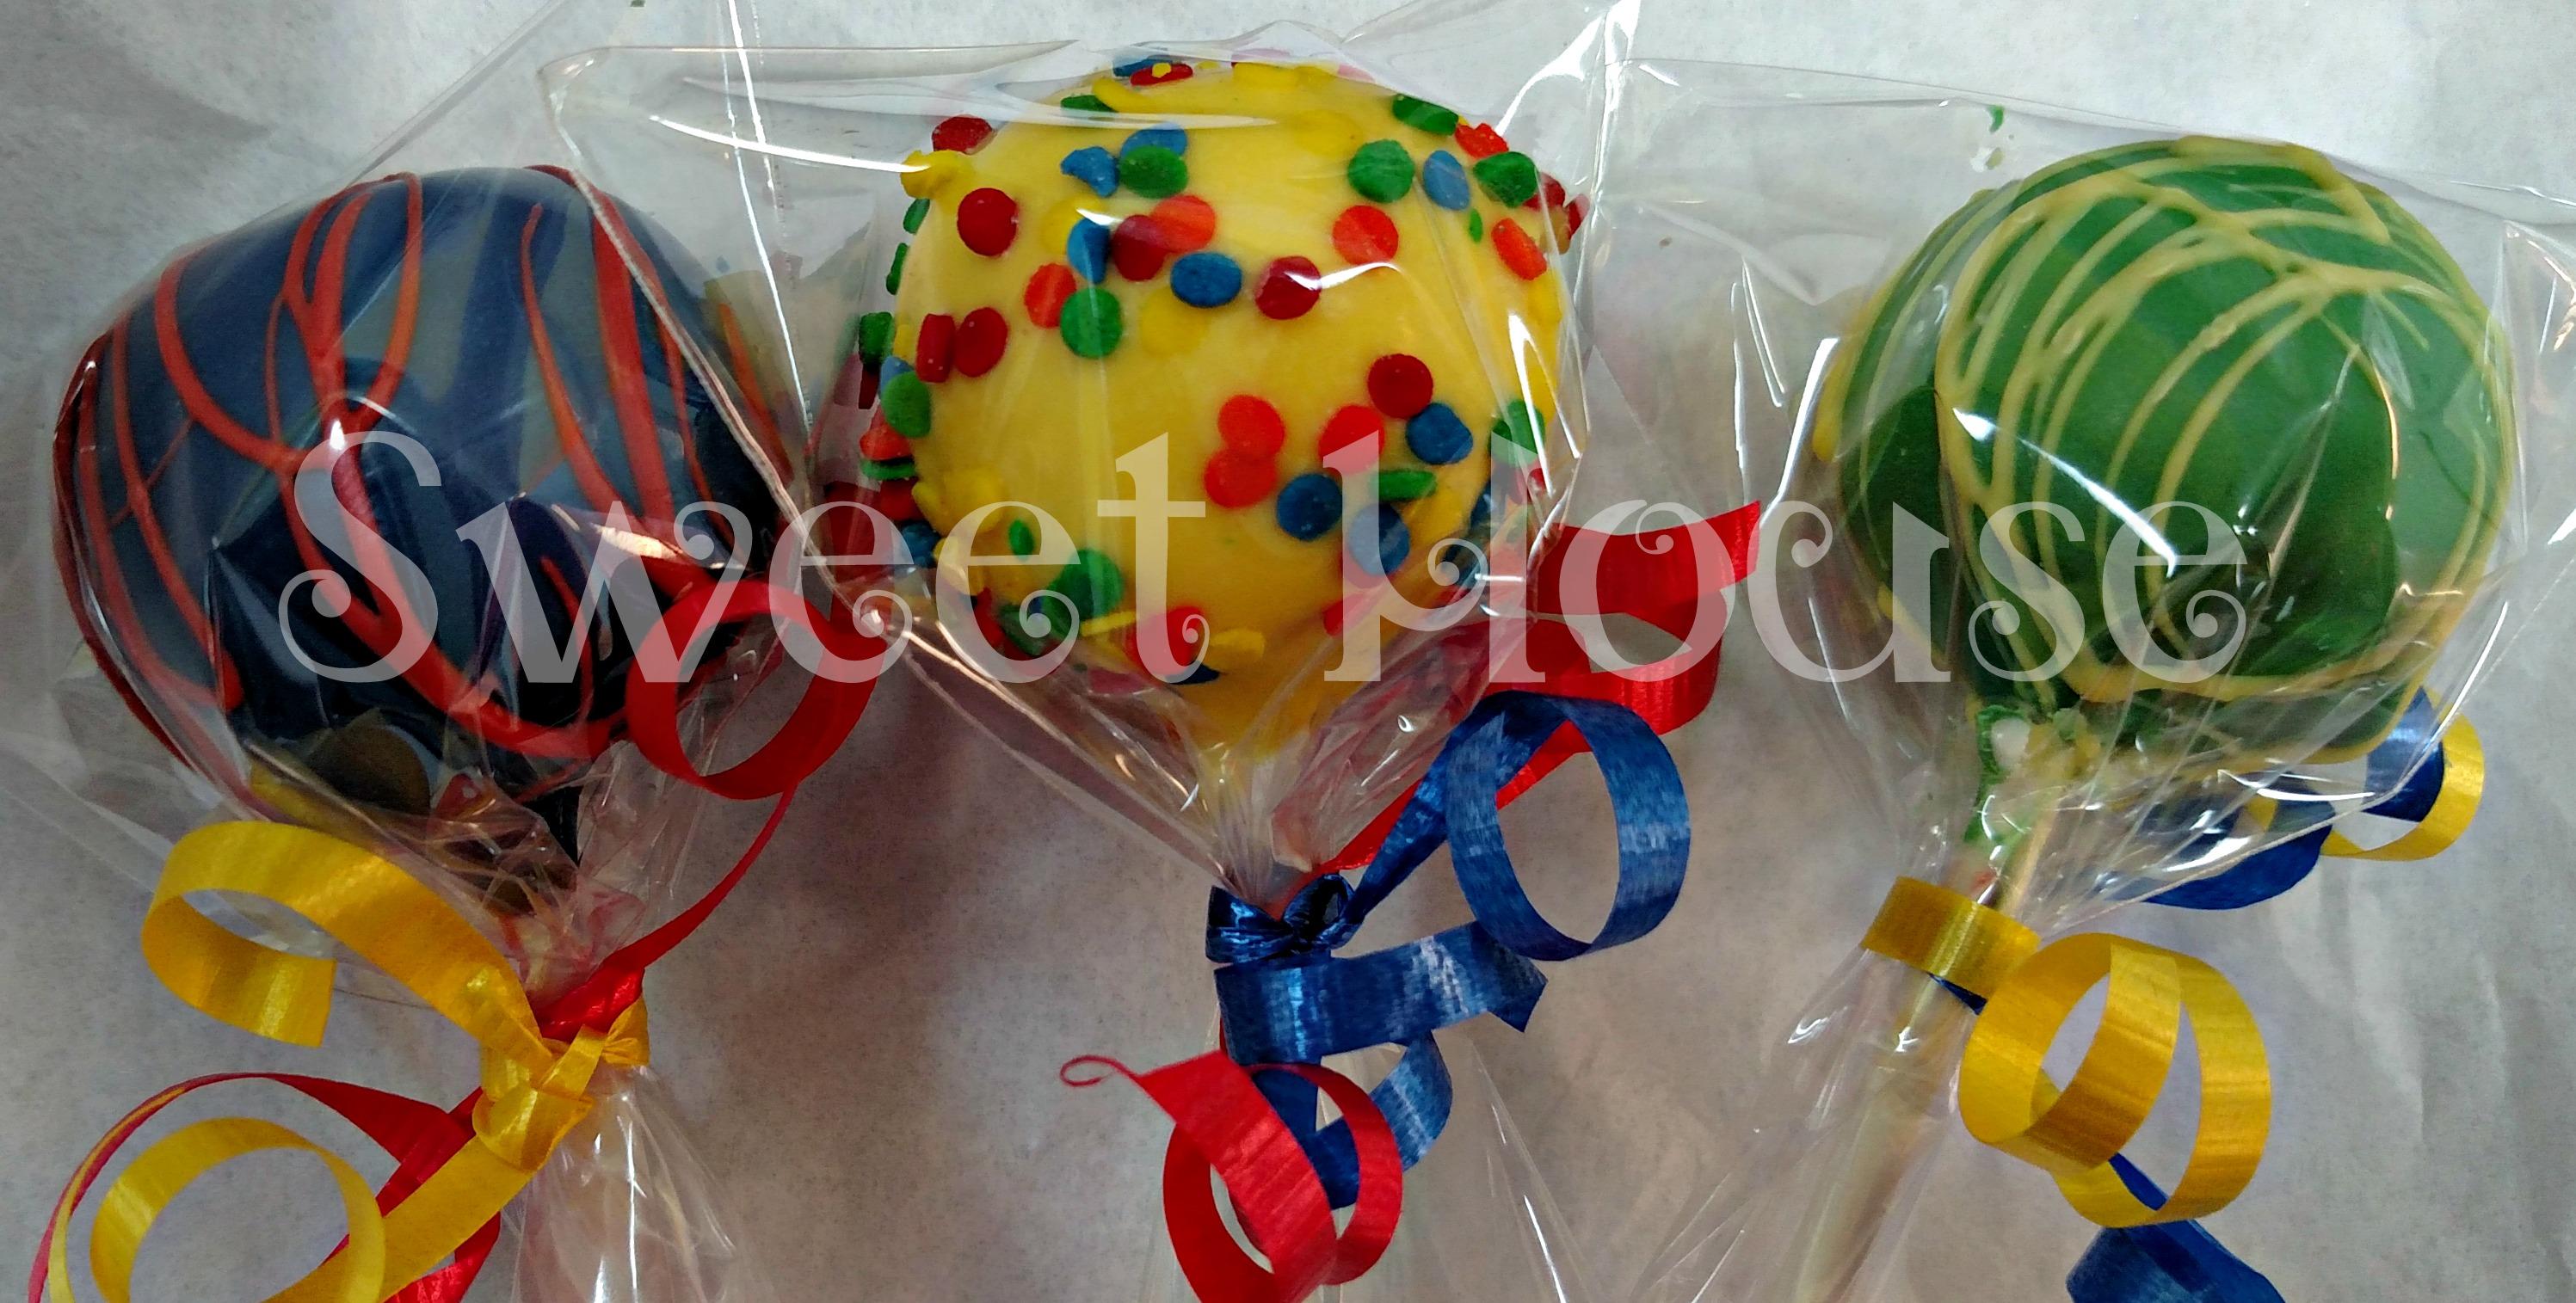 Primary color cake pops